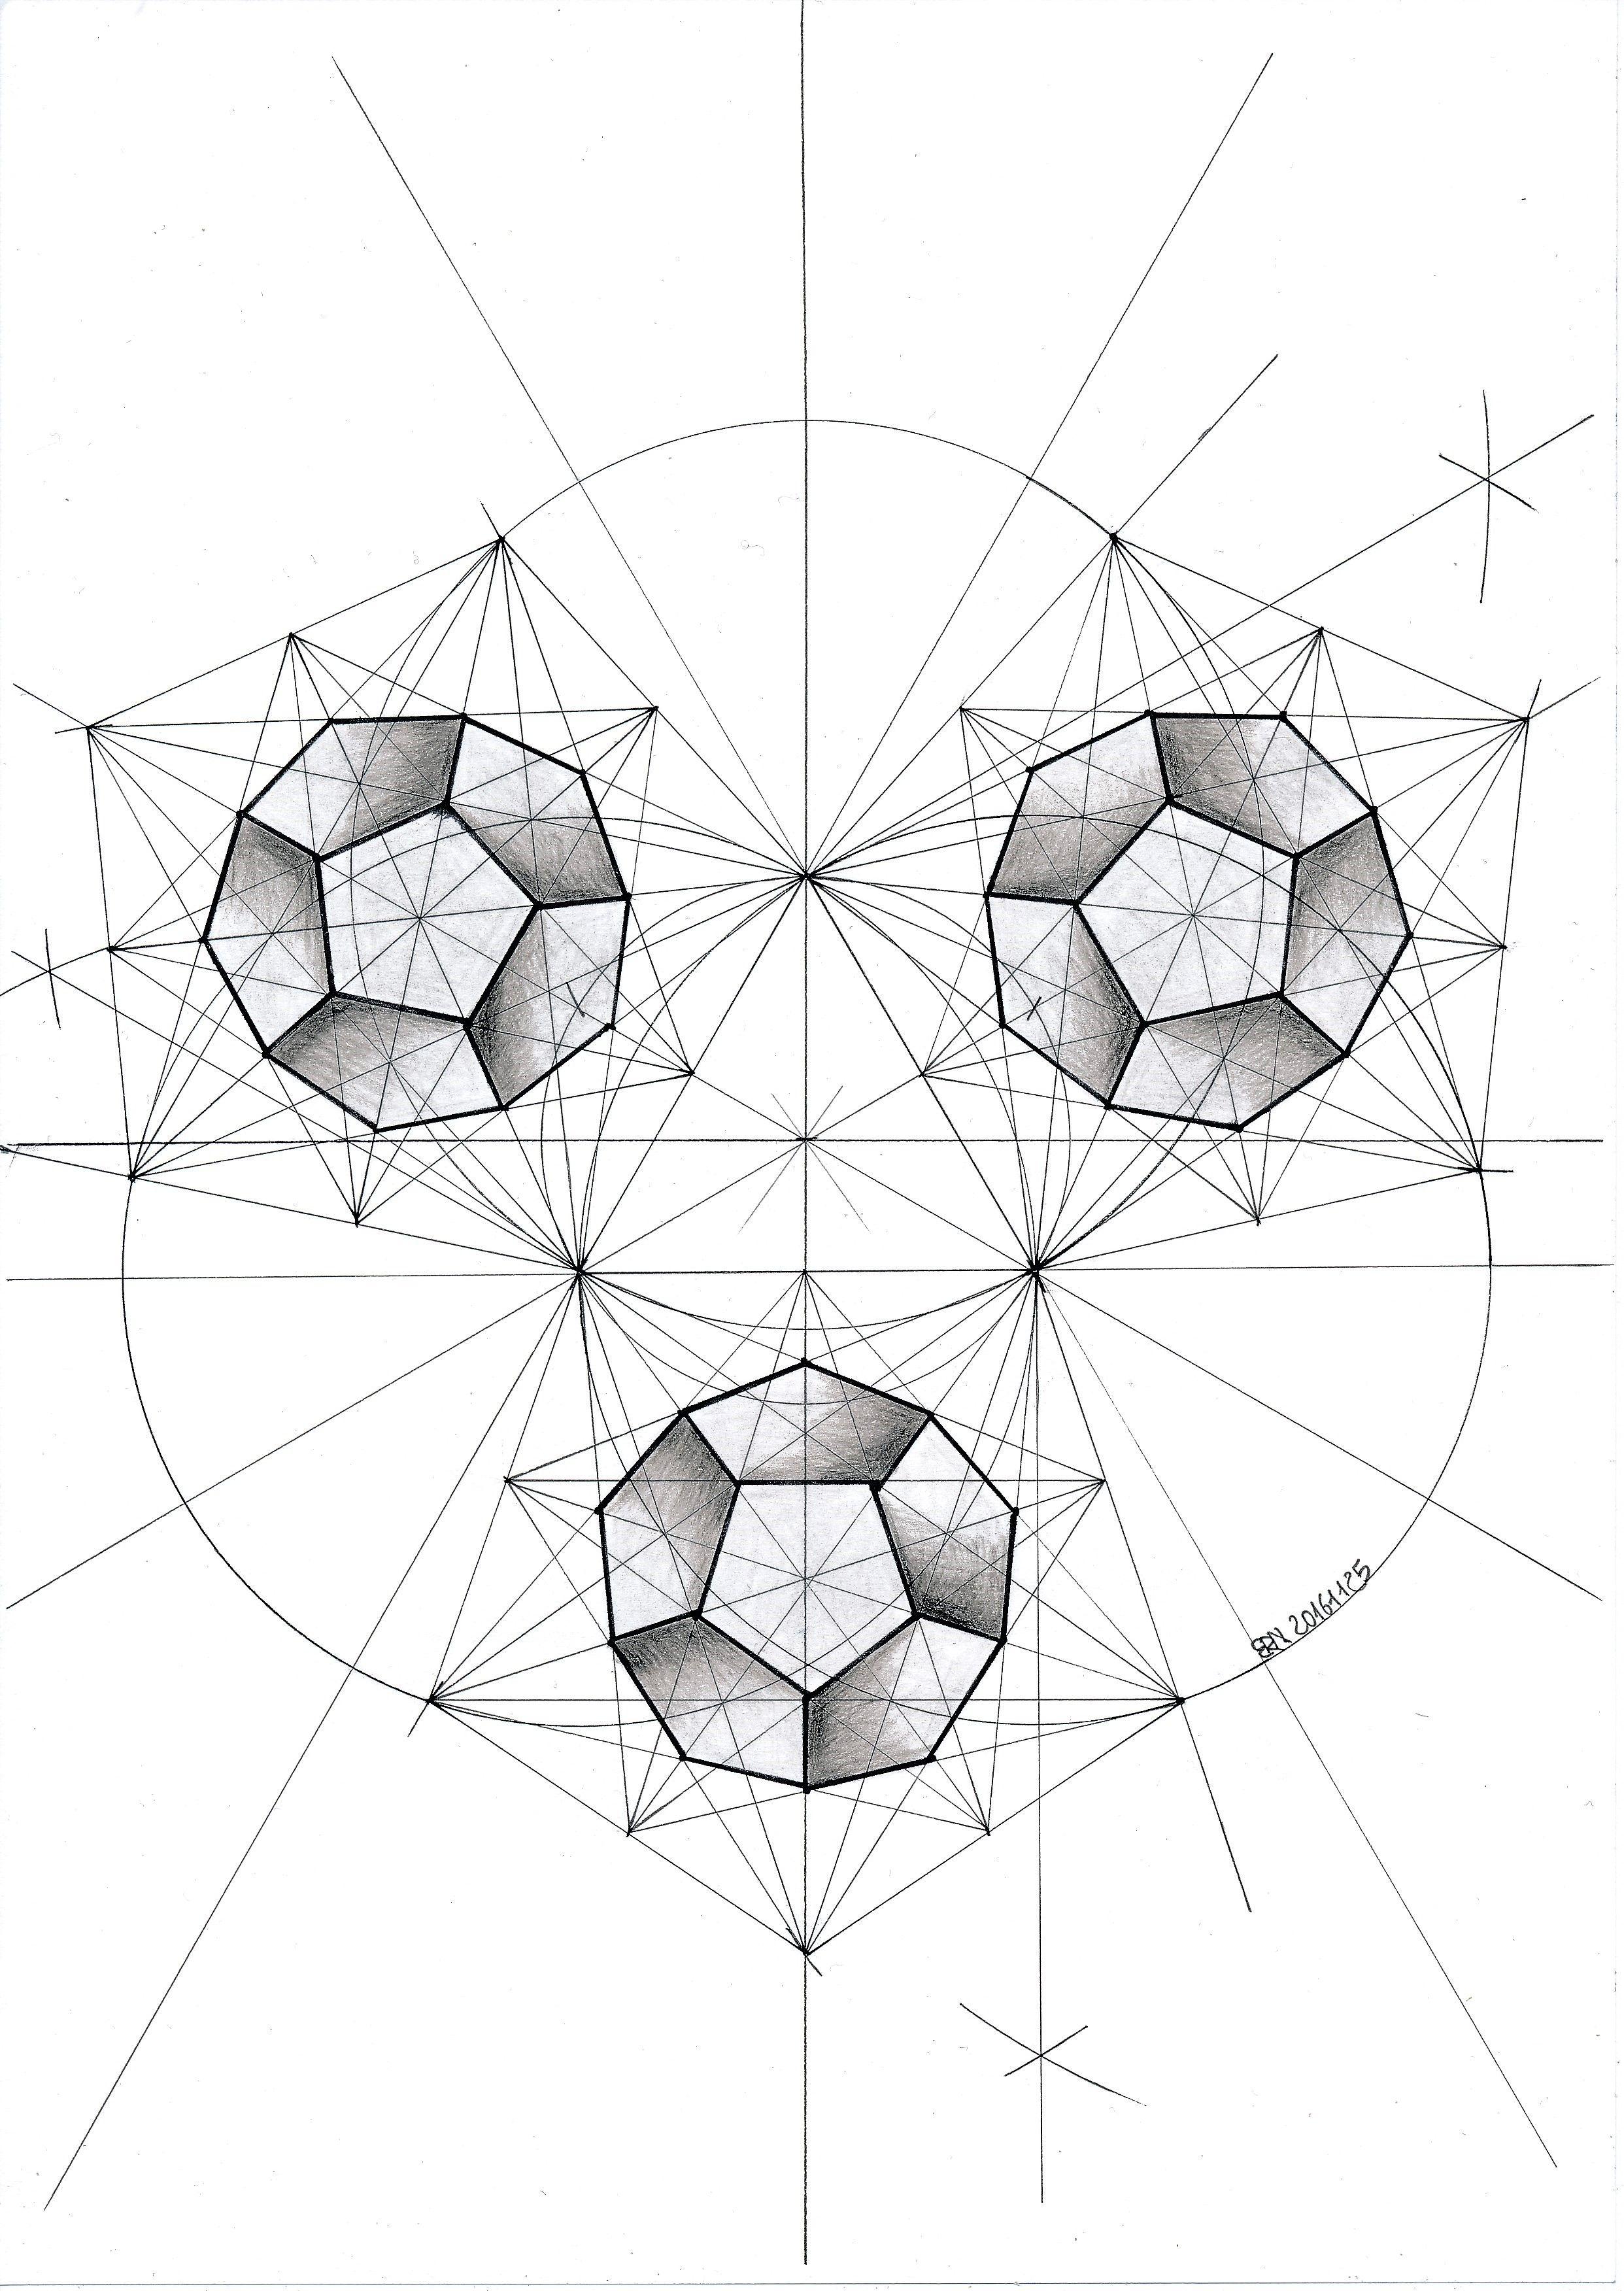 #polyhedra #solid #geometry #symmetry #pattern #pentagon #